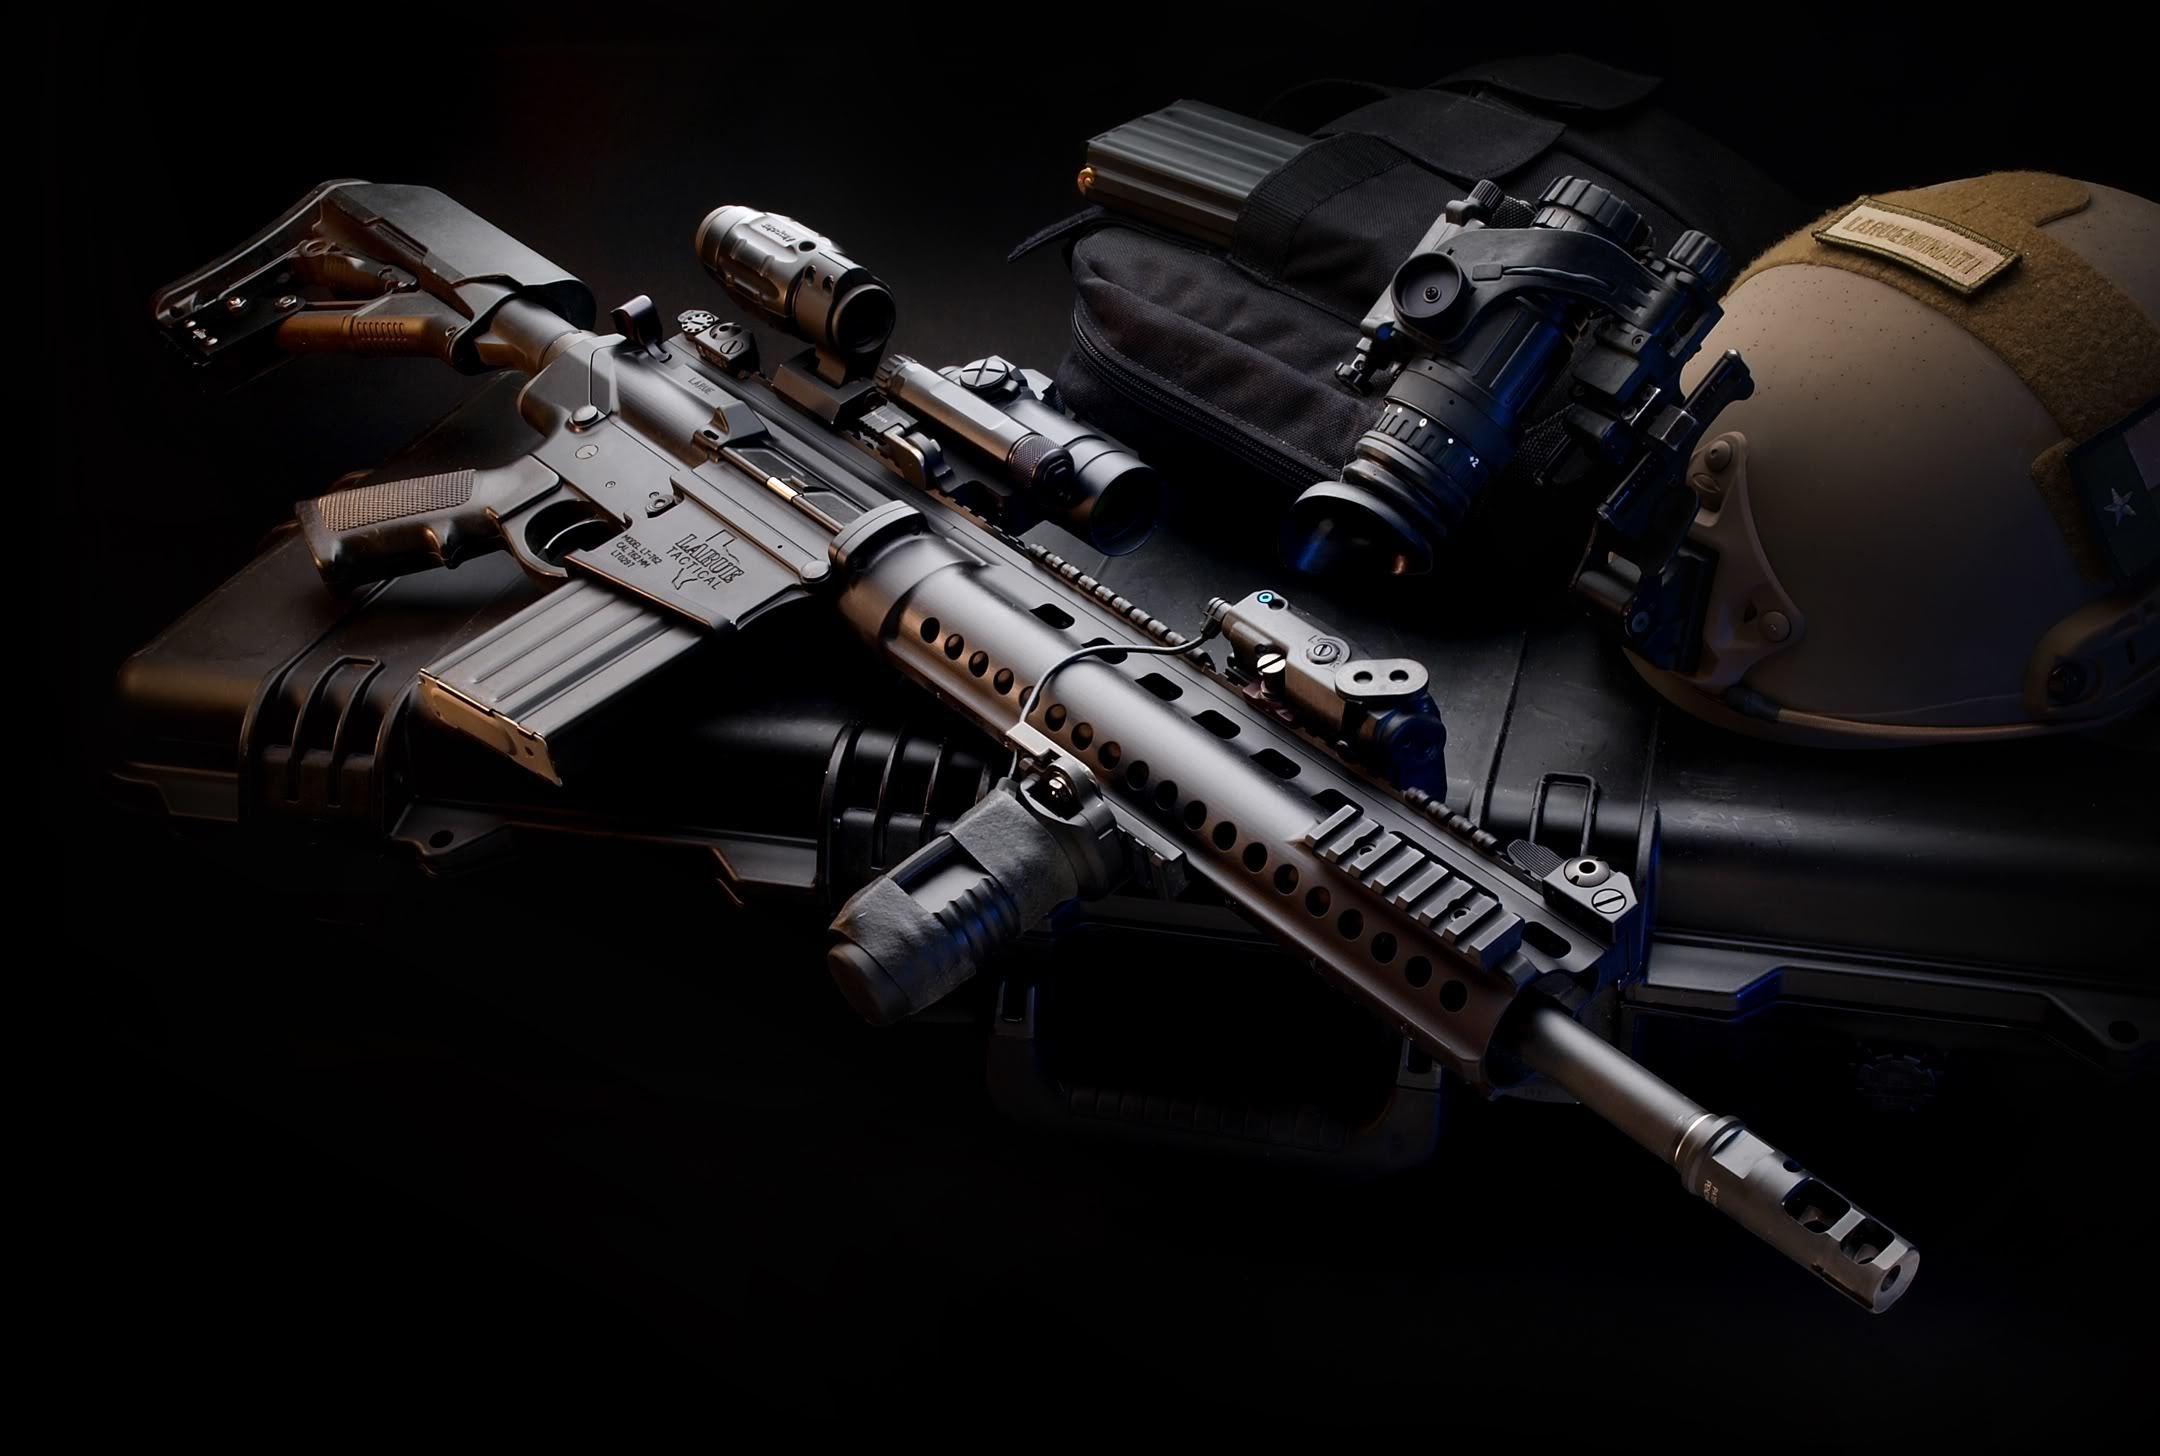 Automatic Carbine Wallpaper 2160x1456 171716 Wallpaperup